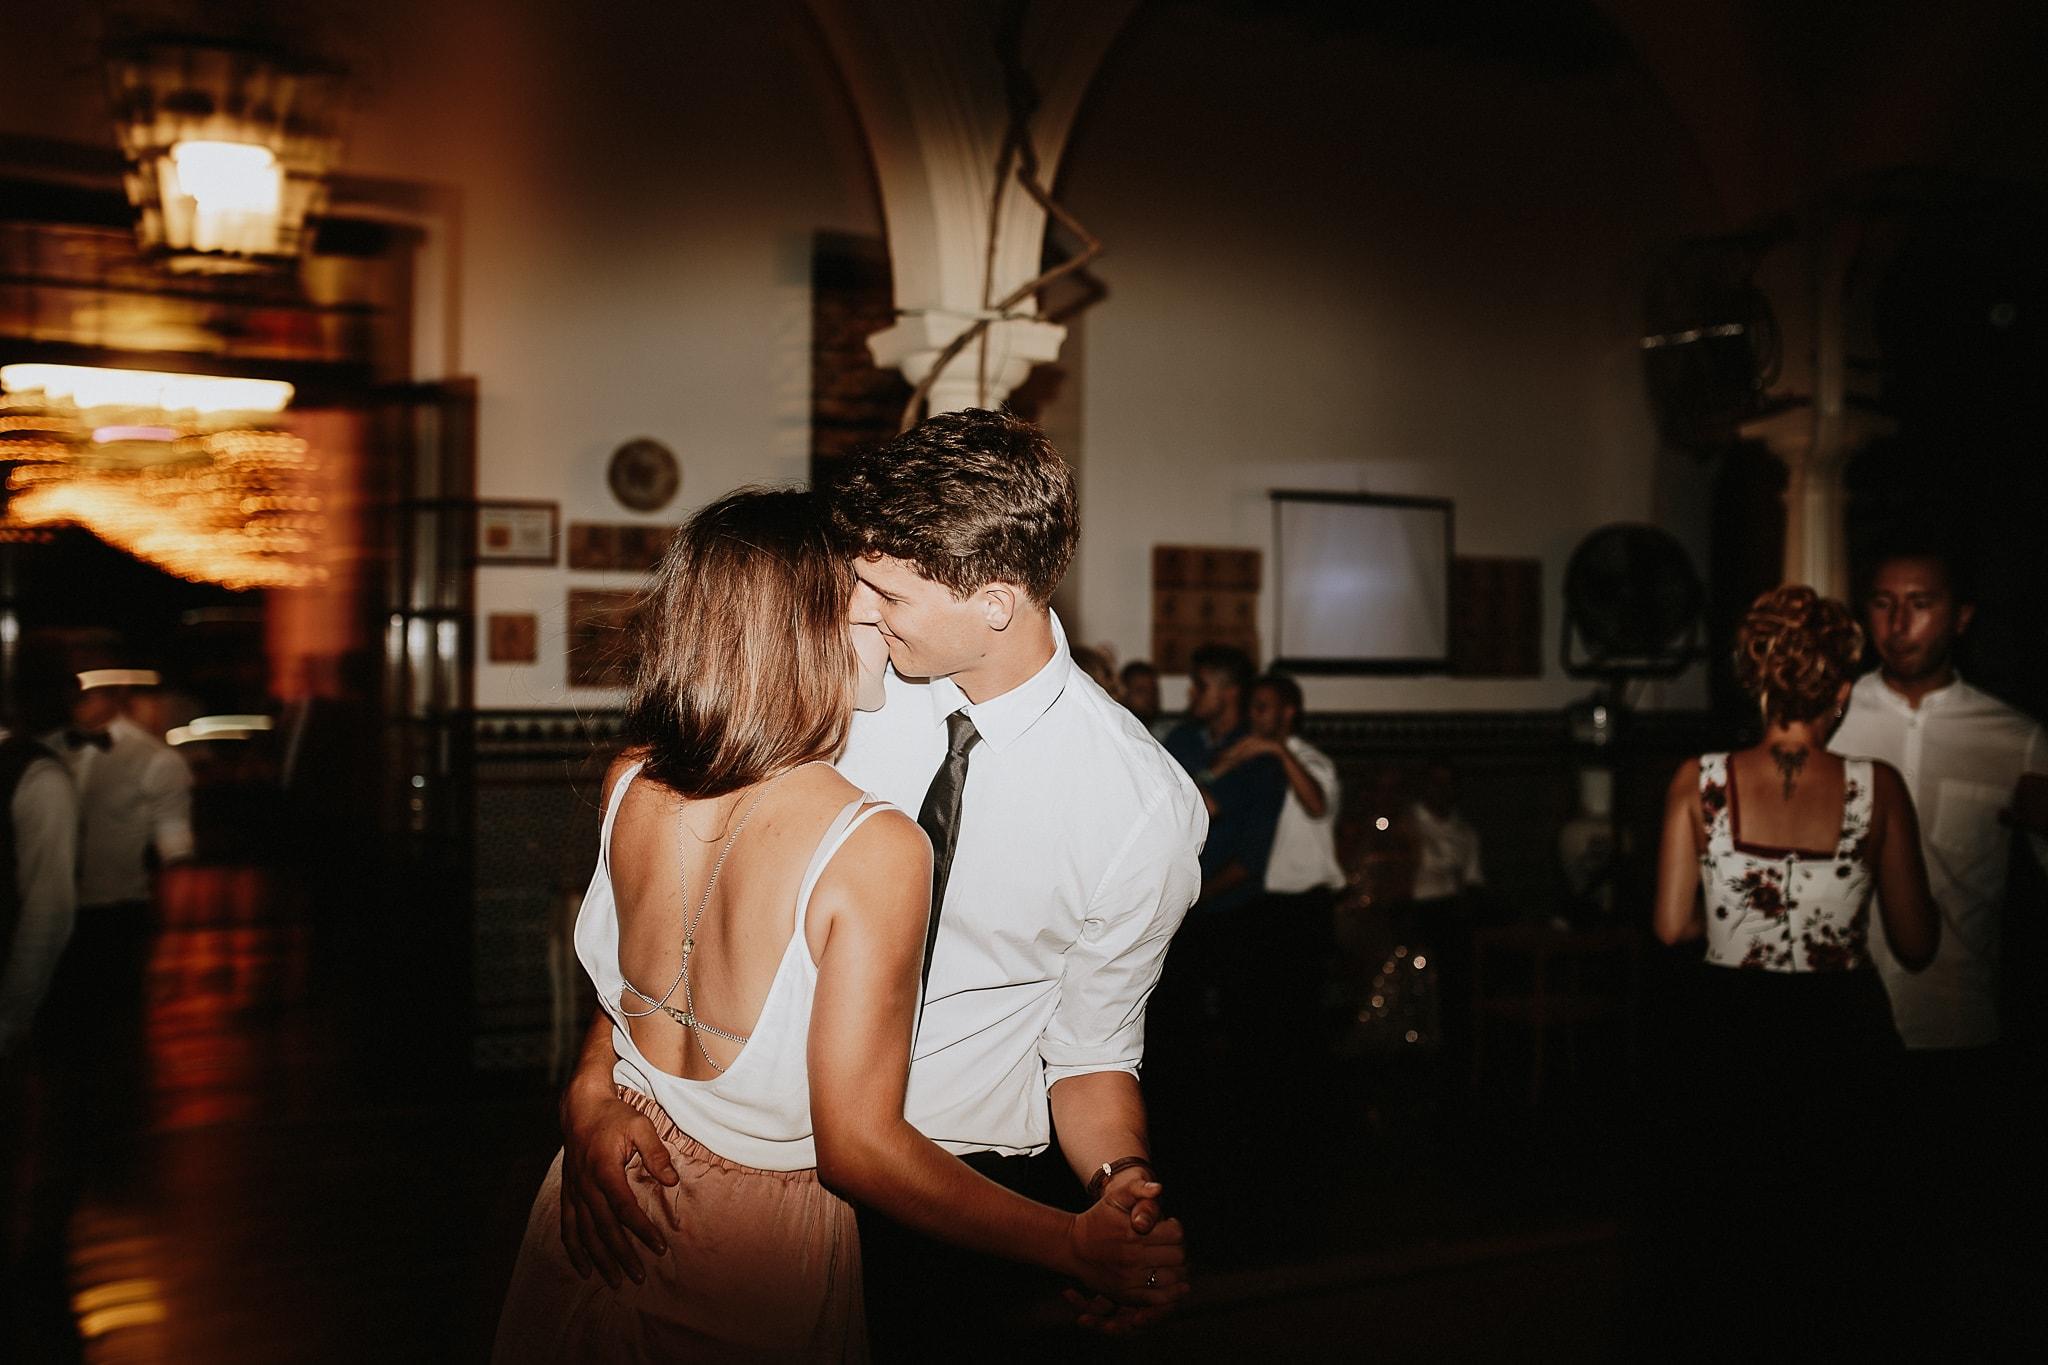 fotografo-bodas-altea-99a